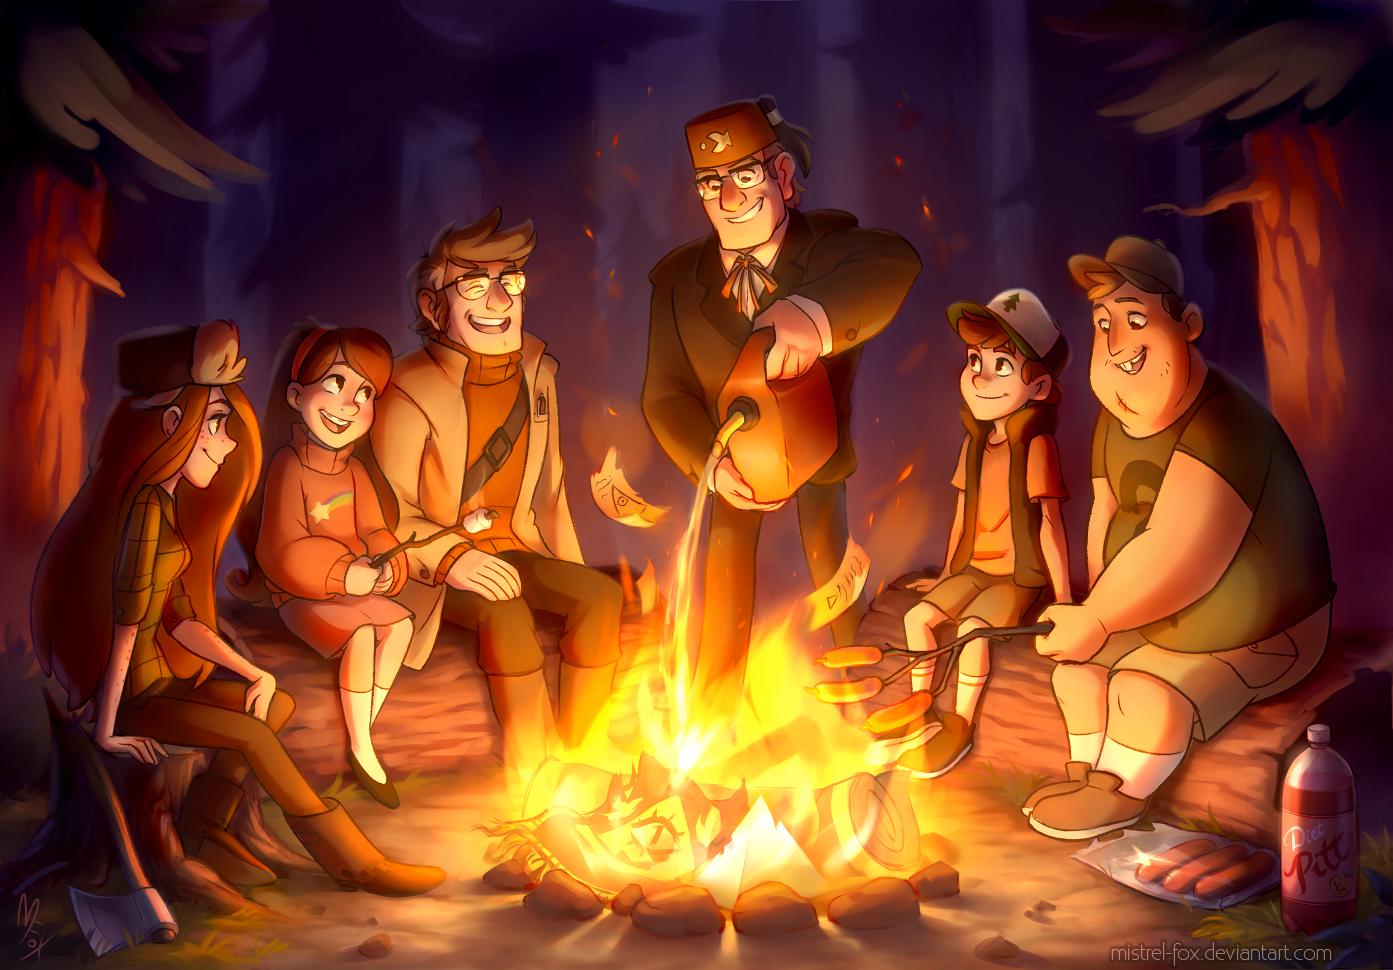 ::GF:: Last campfire of the summer